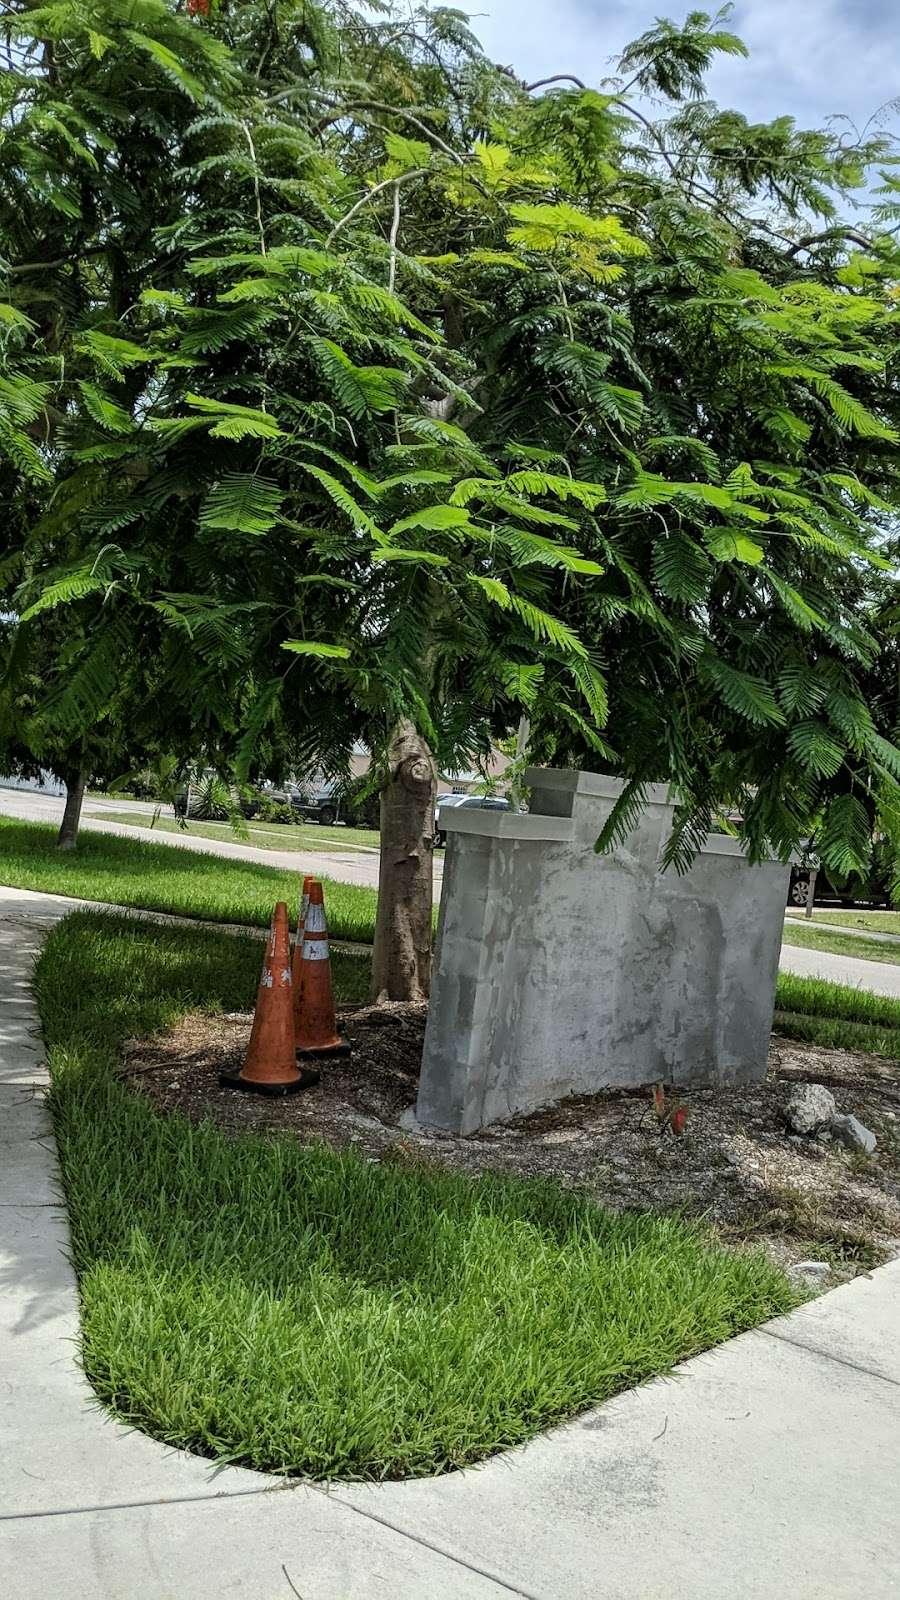 Sauls Park - park  | Photo 4 of 6 | Address: NE 13th Ave, North Miami Beach, FL 33162, USA